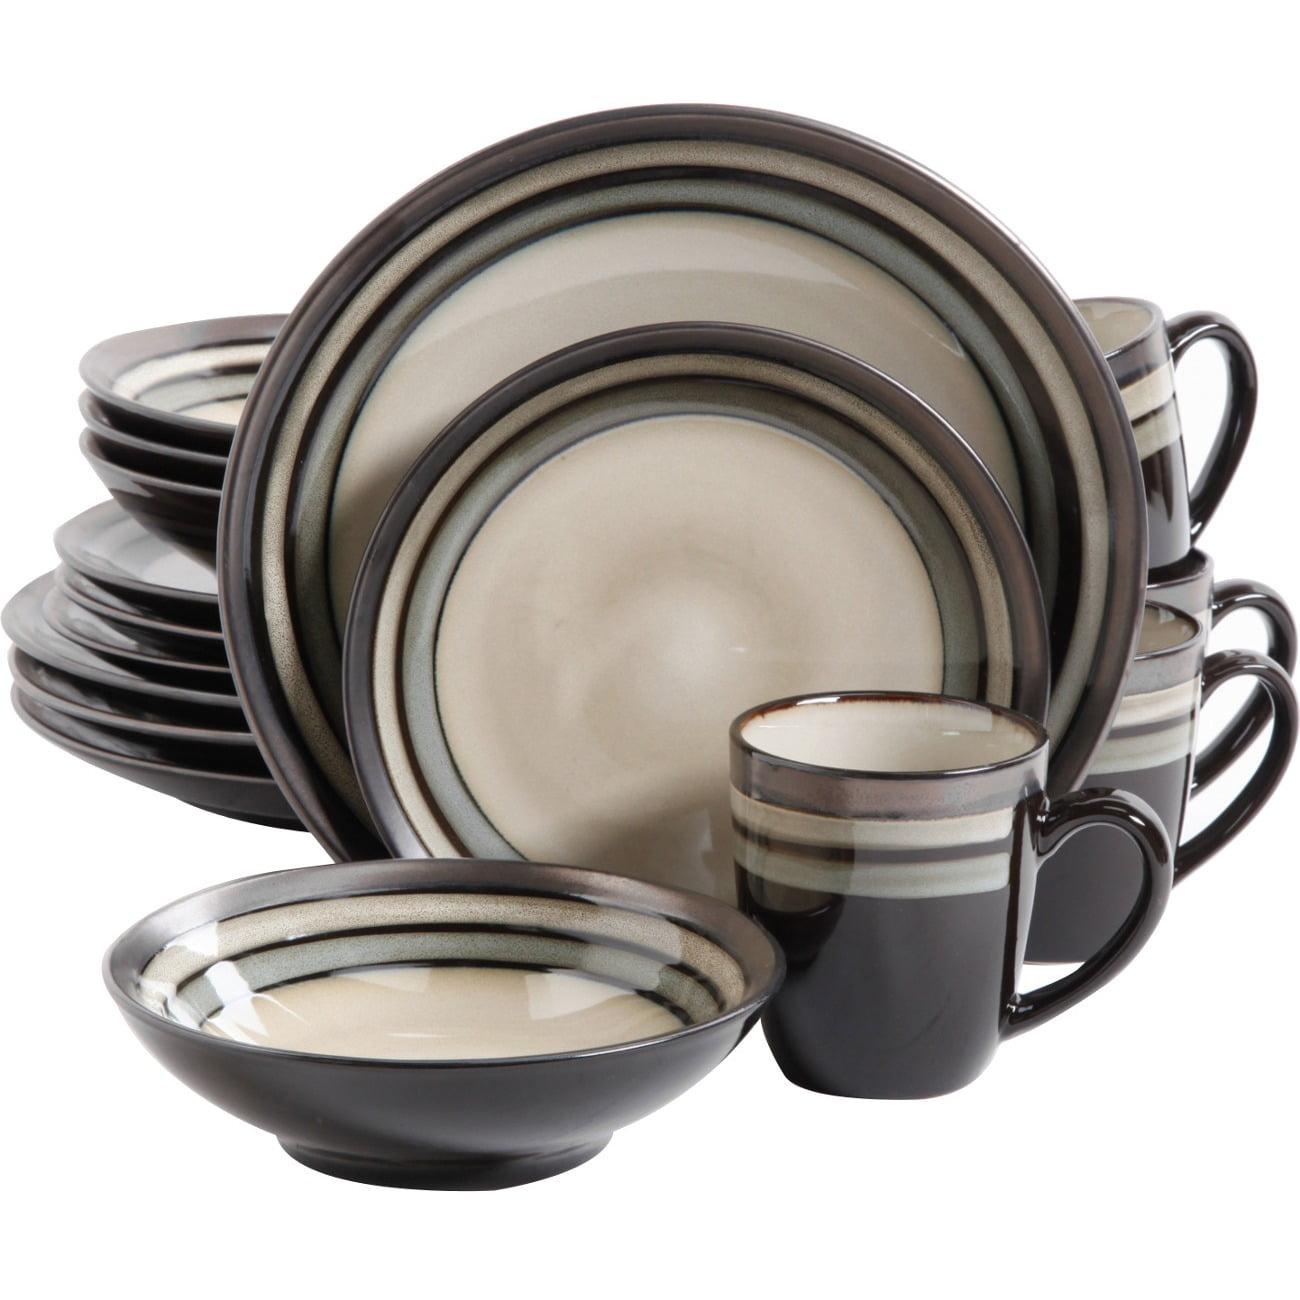 sc 1 st  Walmart & Gibson Lewisville 16pc Dinnerware Set - Gray - Walmart.com